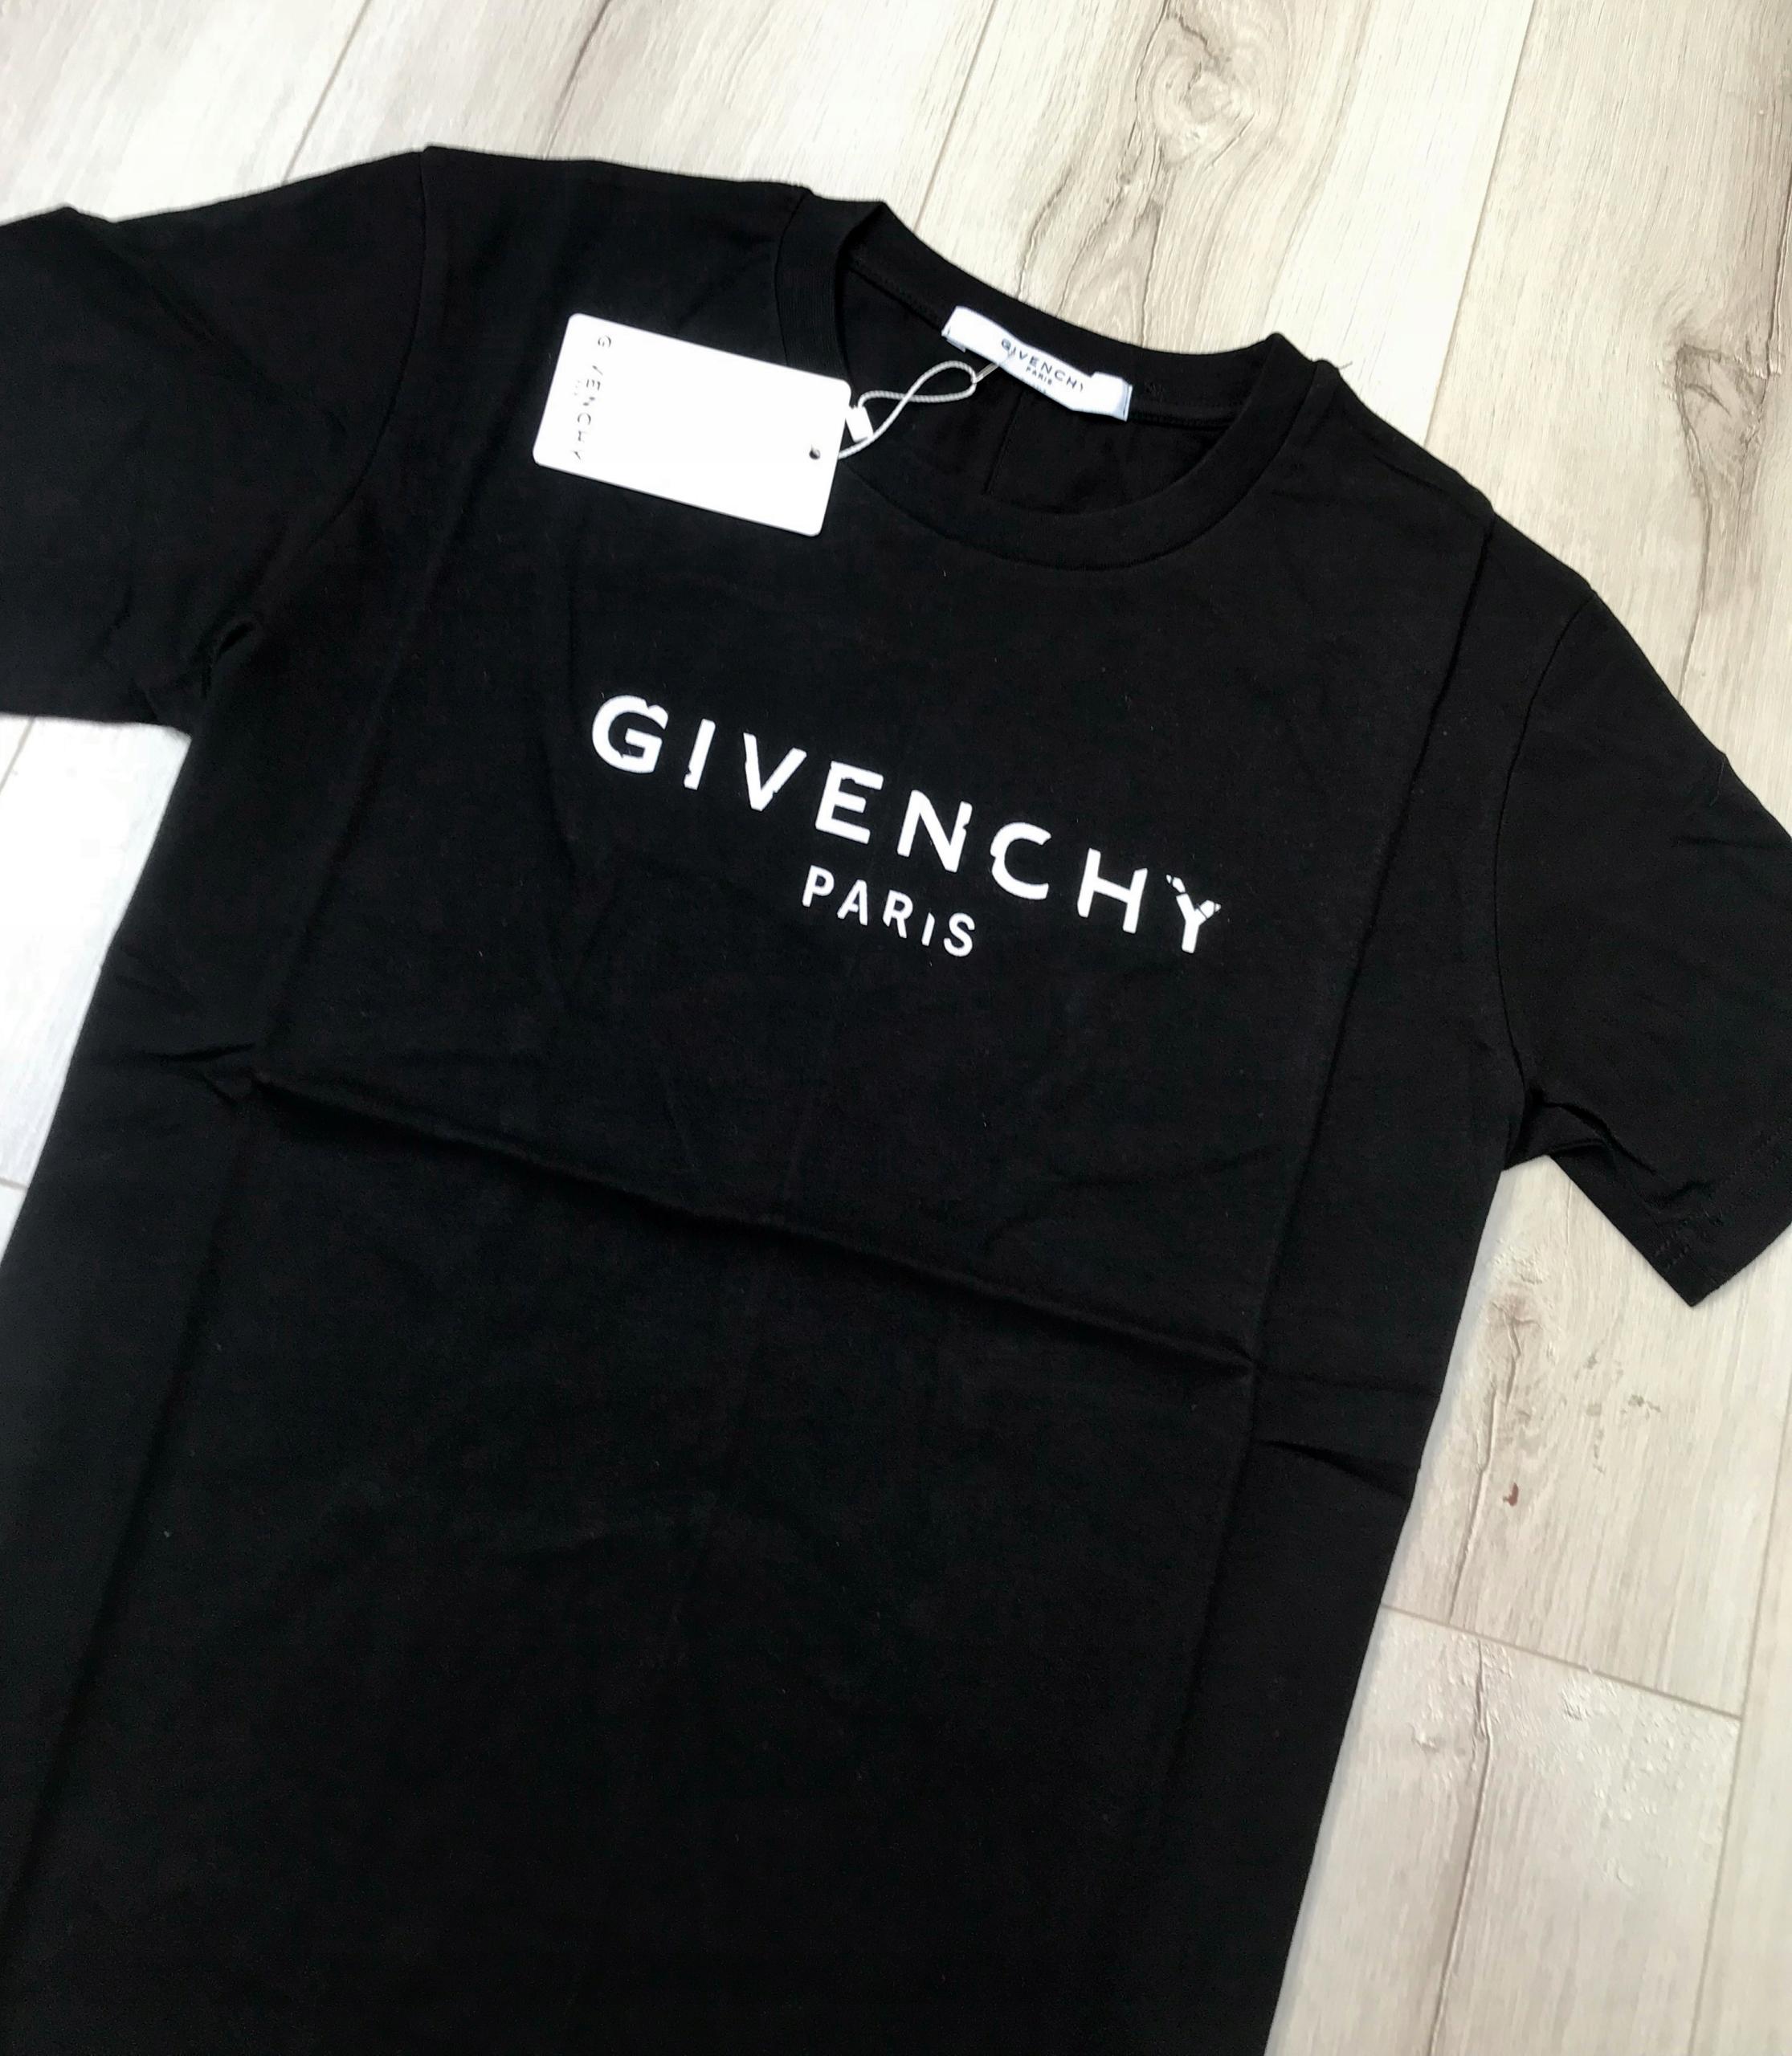 Super Koszulka T-Shirt Givenchy Paris Slim Fit M - 7477862318 GS01